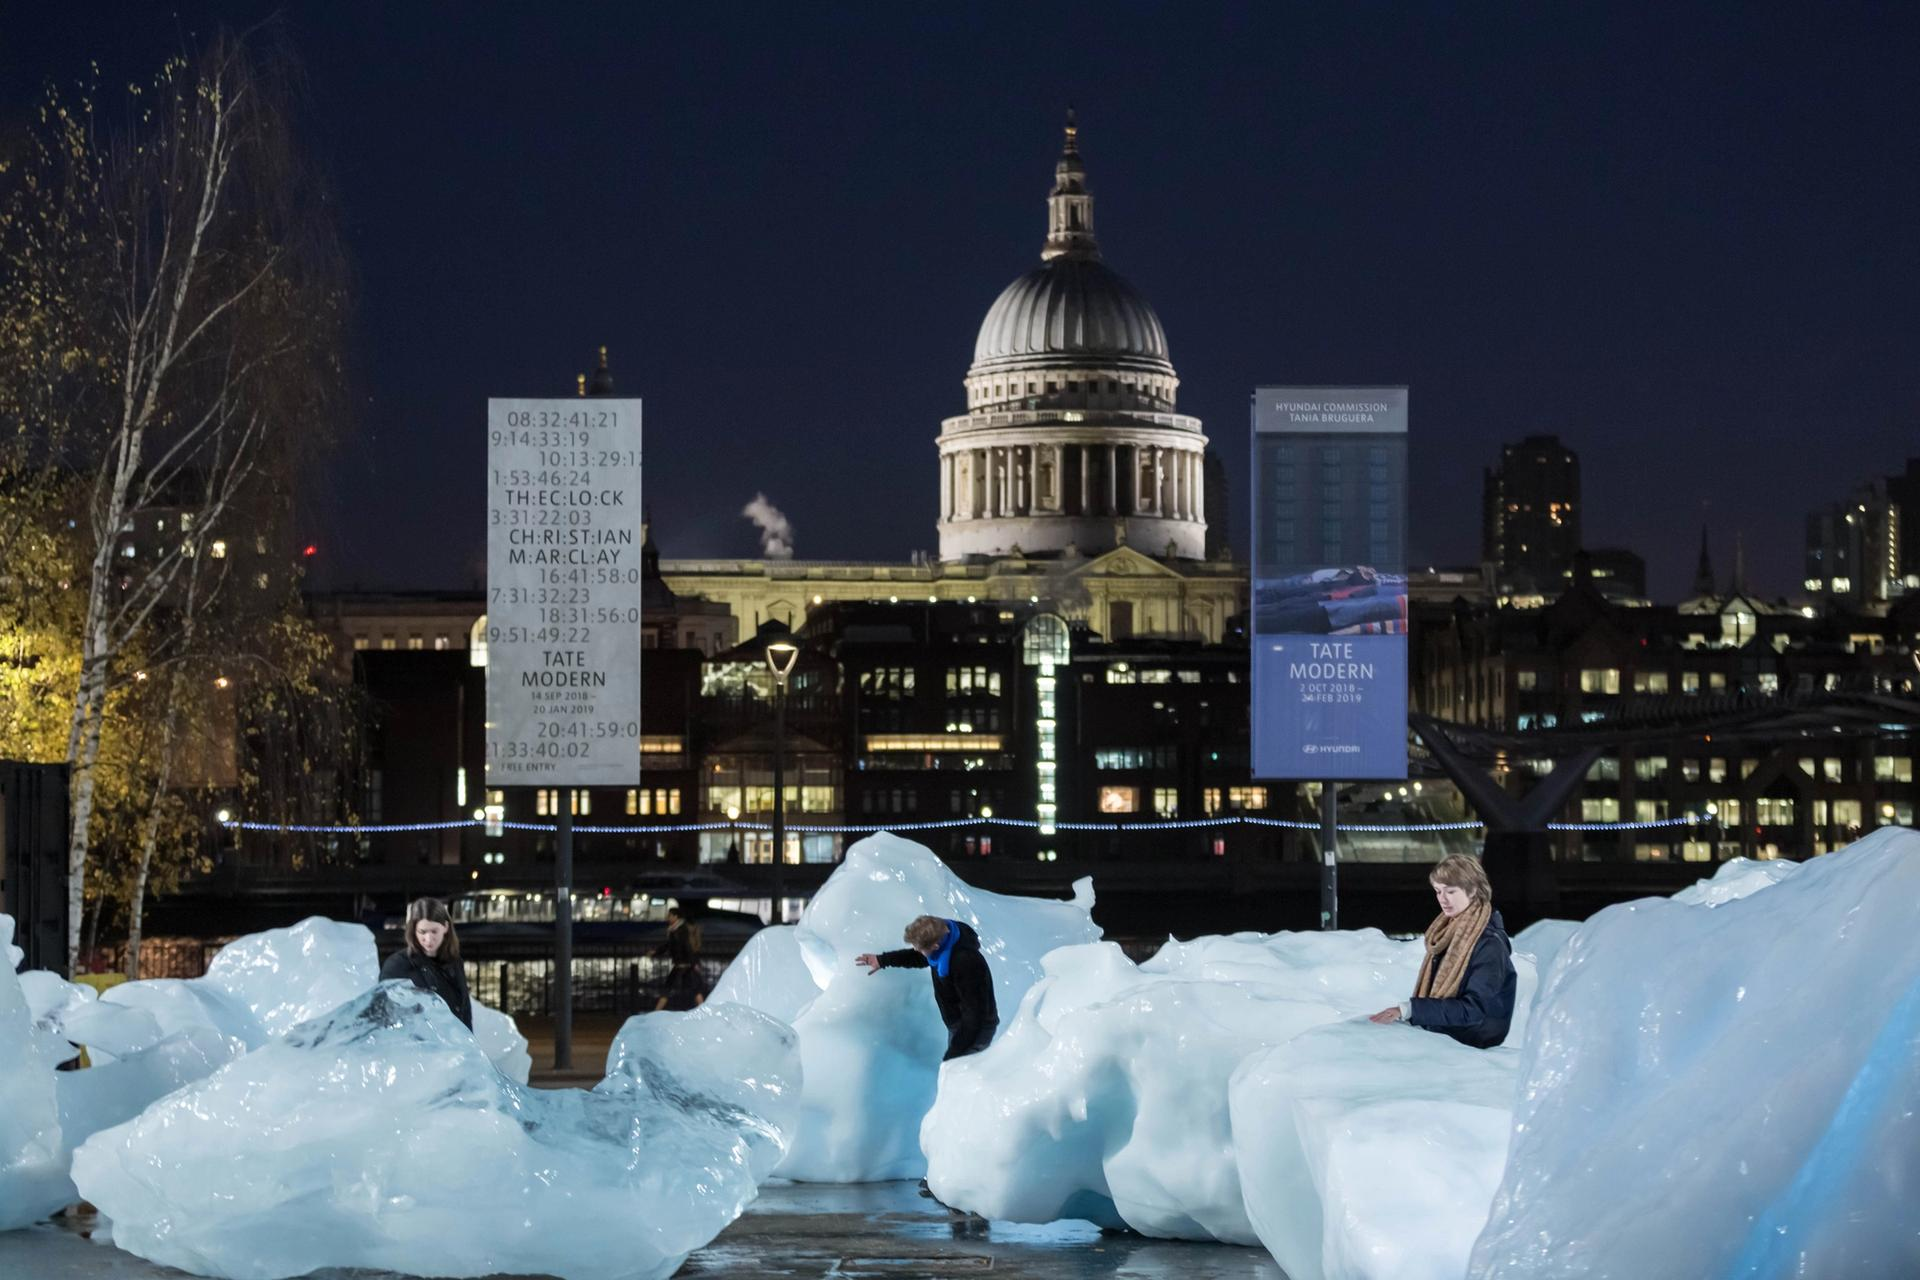 Olafur Eliasson and Minik Rosing's Ice Watch installation at Bankside, outside Tate Modern Photo: Justin Sutcliffe © 2018 Olafur Eliasson